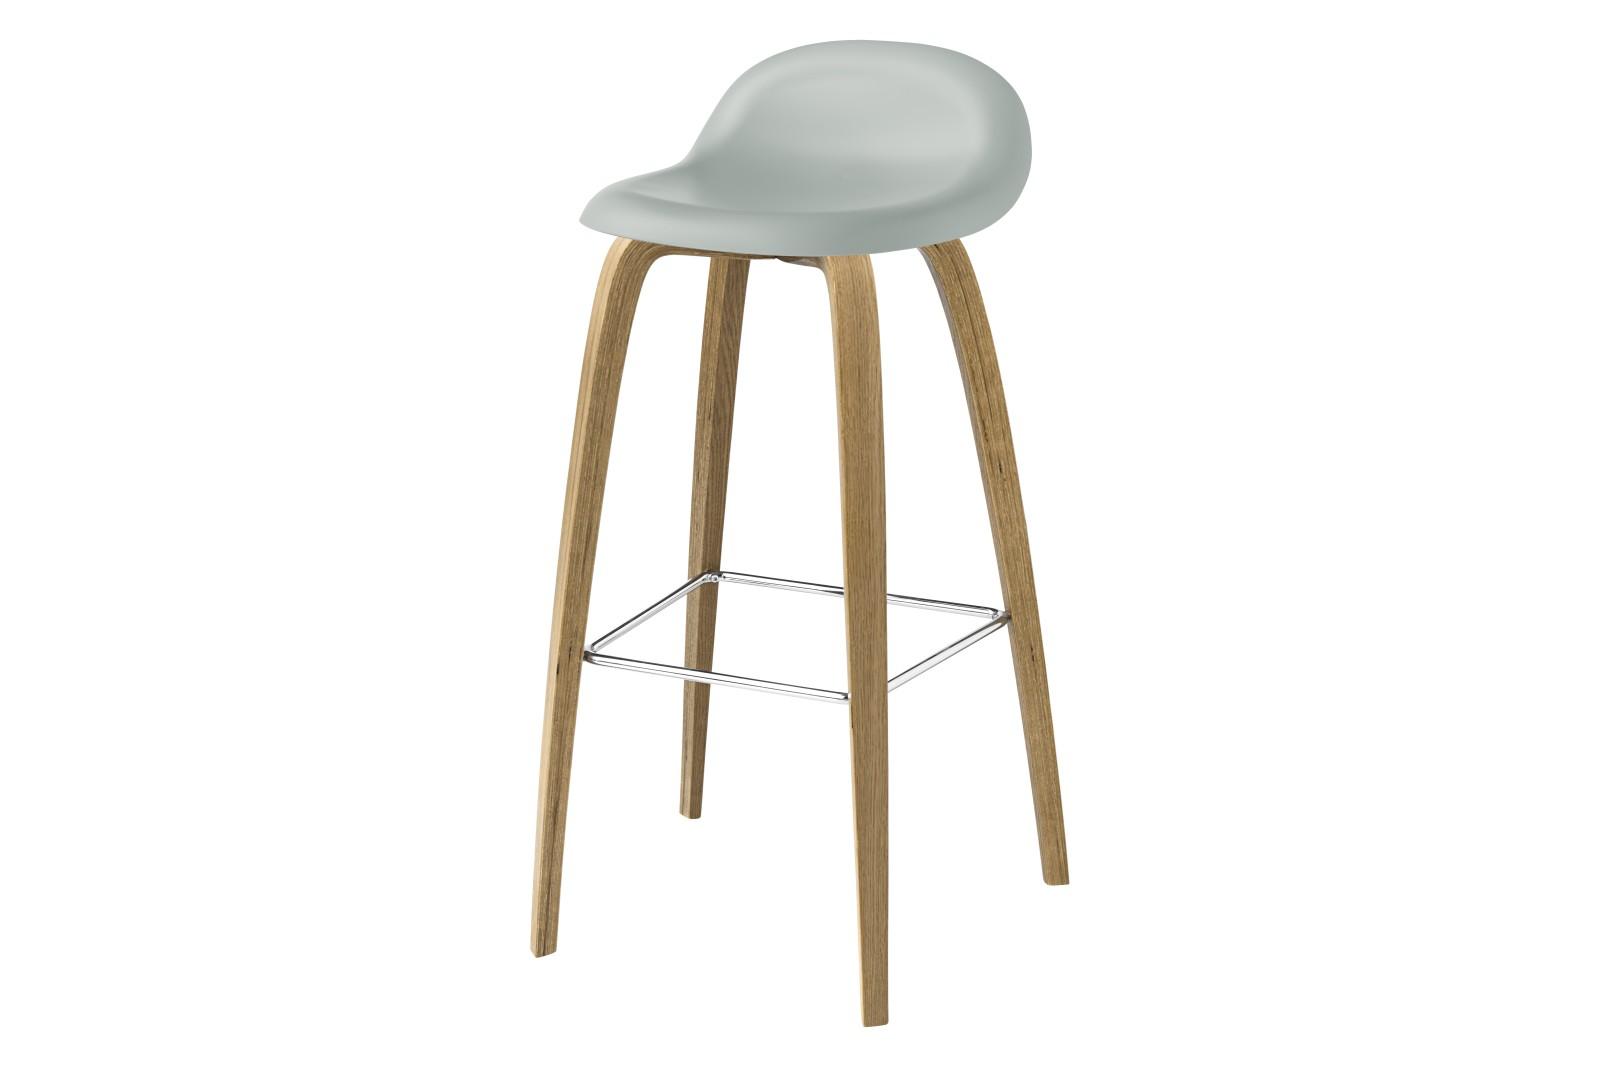 3D Bar Stool - Un-Upholstered, Wood Base Gubi HiRek Nightfall Blue, Gubi Wood Oak, Gubi Metal Chrome